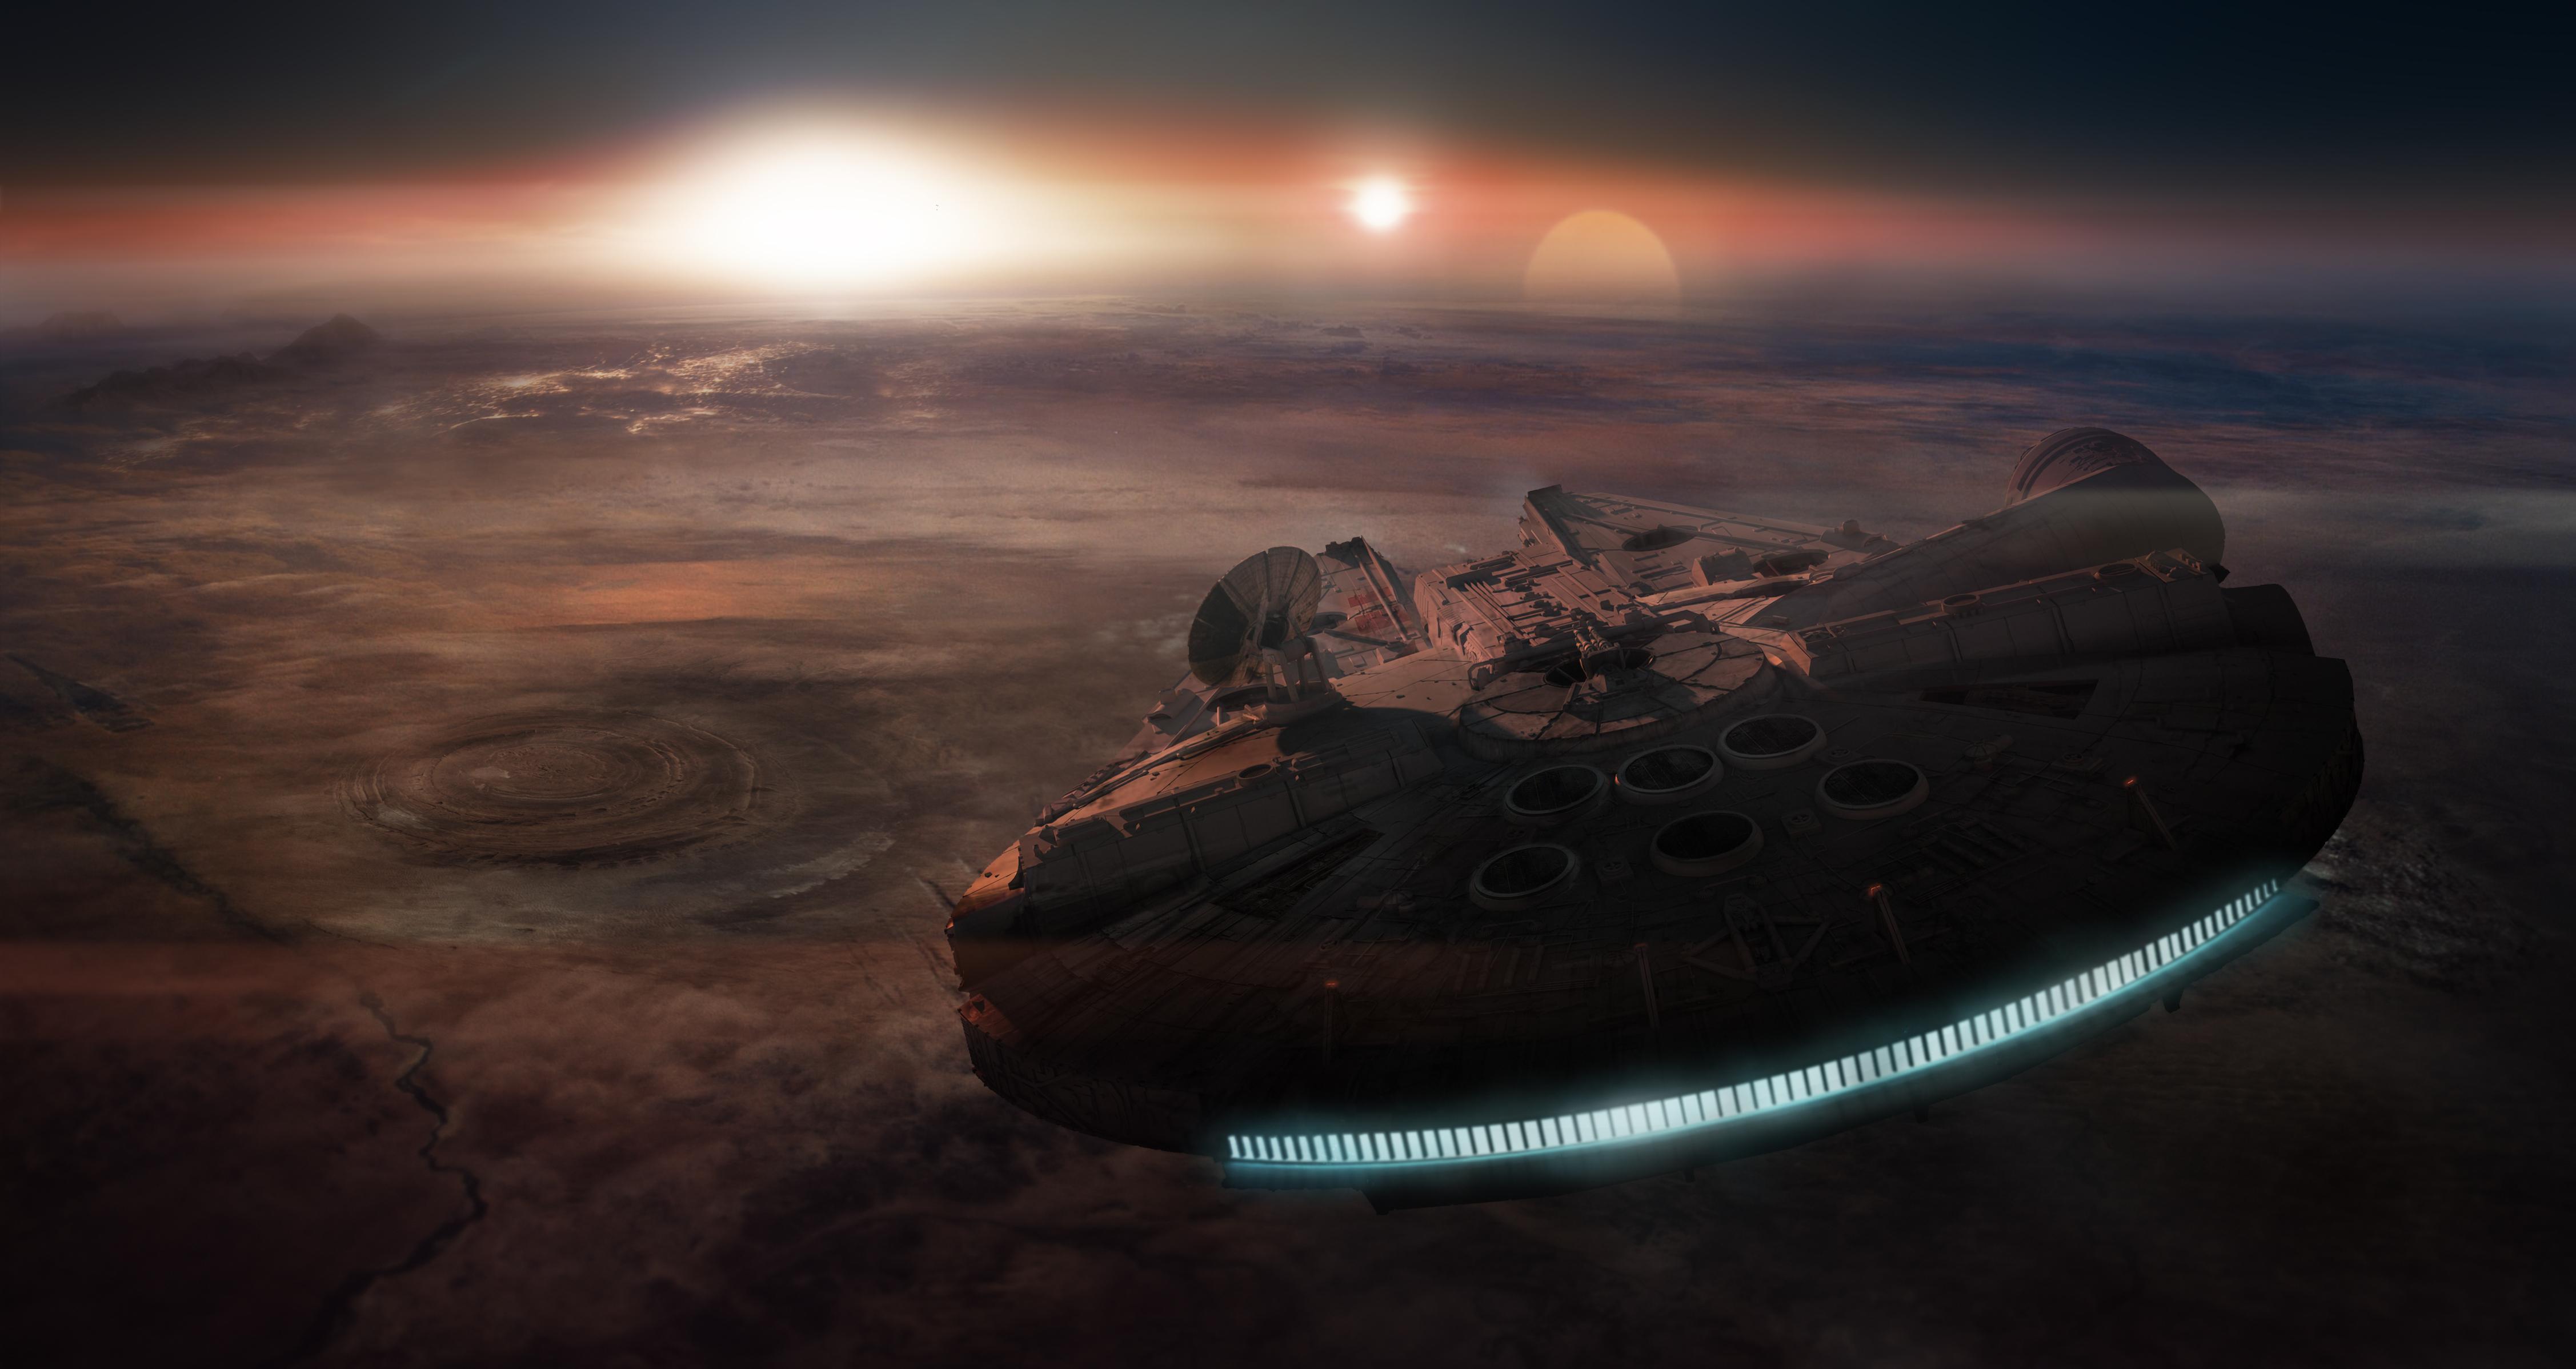 Millennium Falcon Over Tatooine by uPandazoic [4509x2306] iimgur 4509x2396